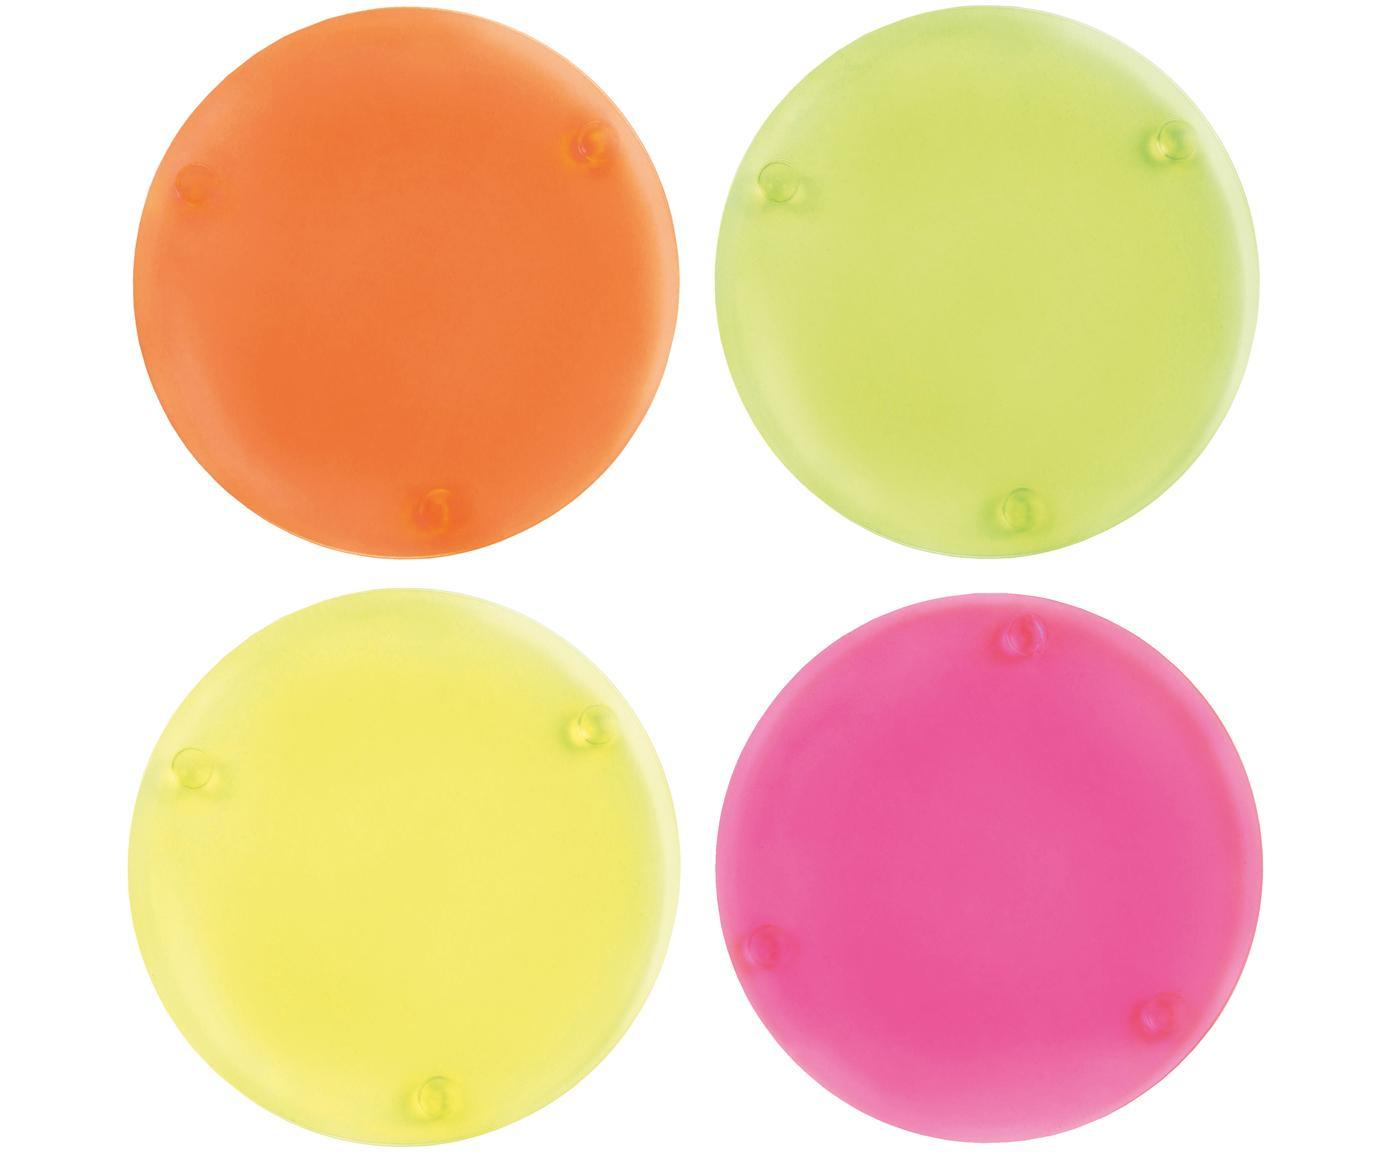 Onderzettersset Neon, 4 stuks, Acryl, Geel, groen, oranje, roze, Ø 10 cm